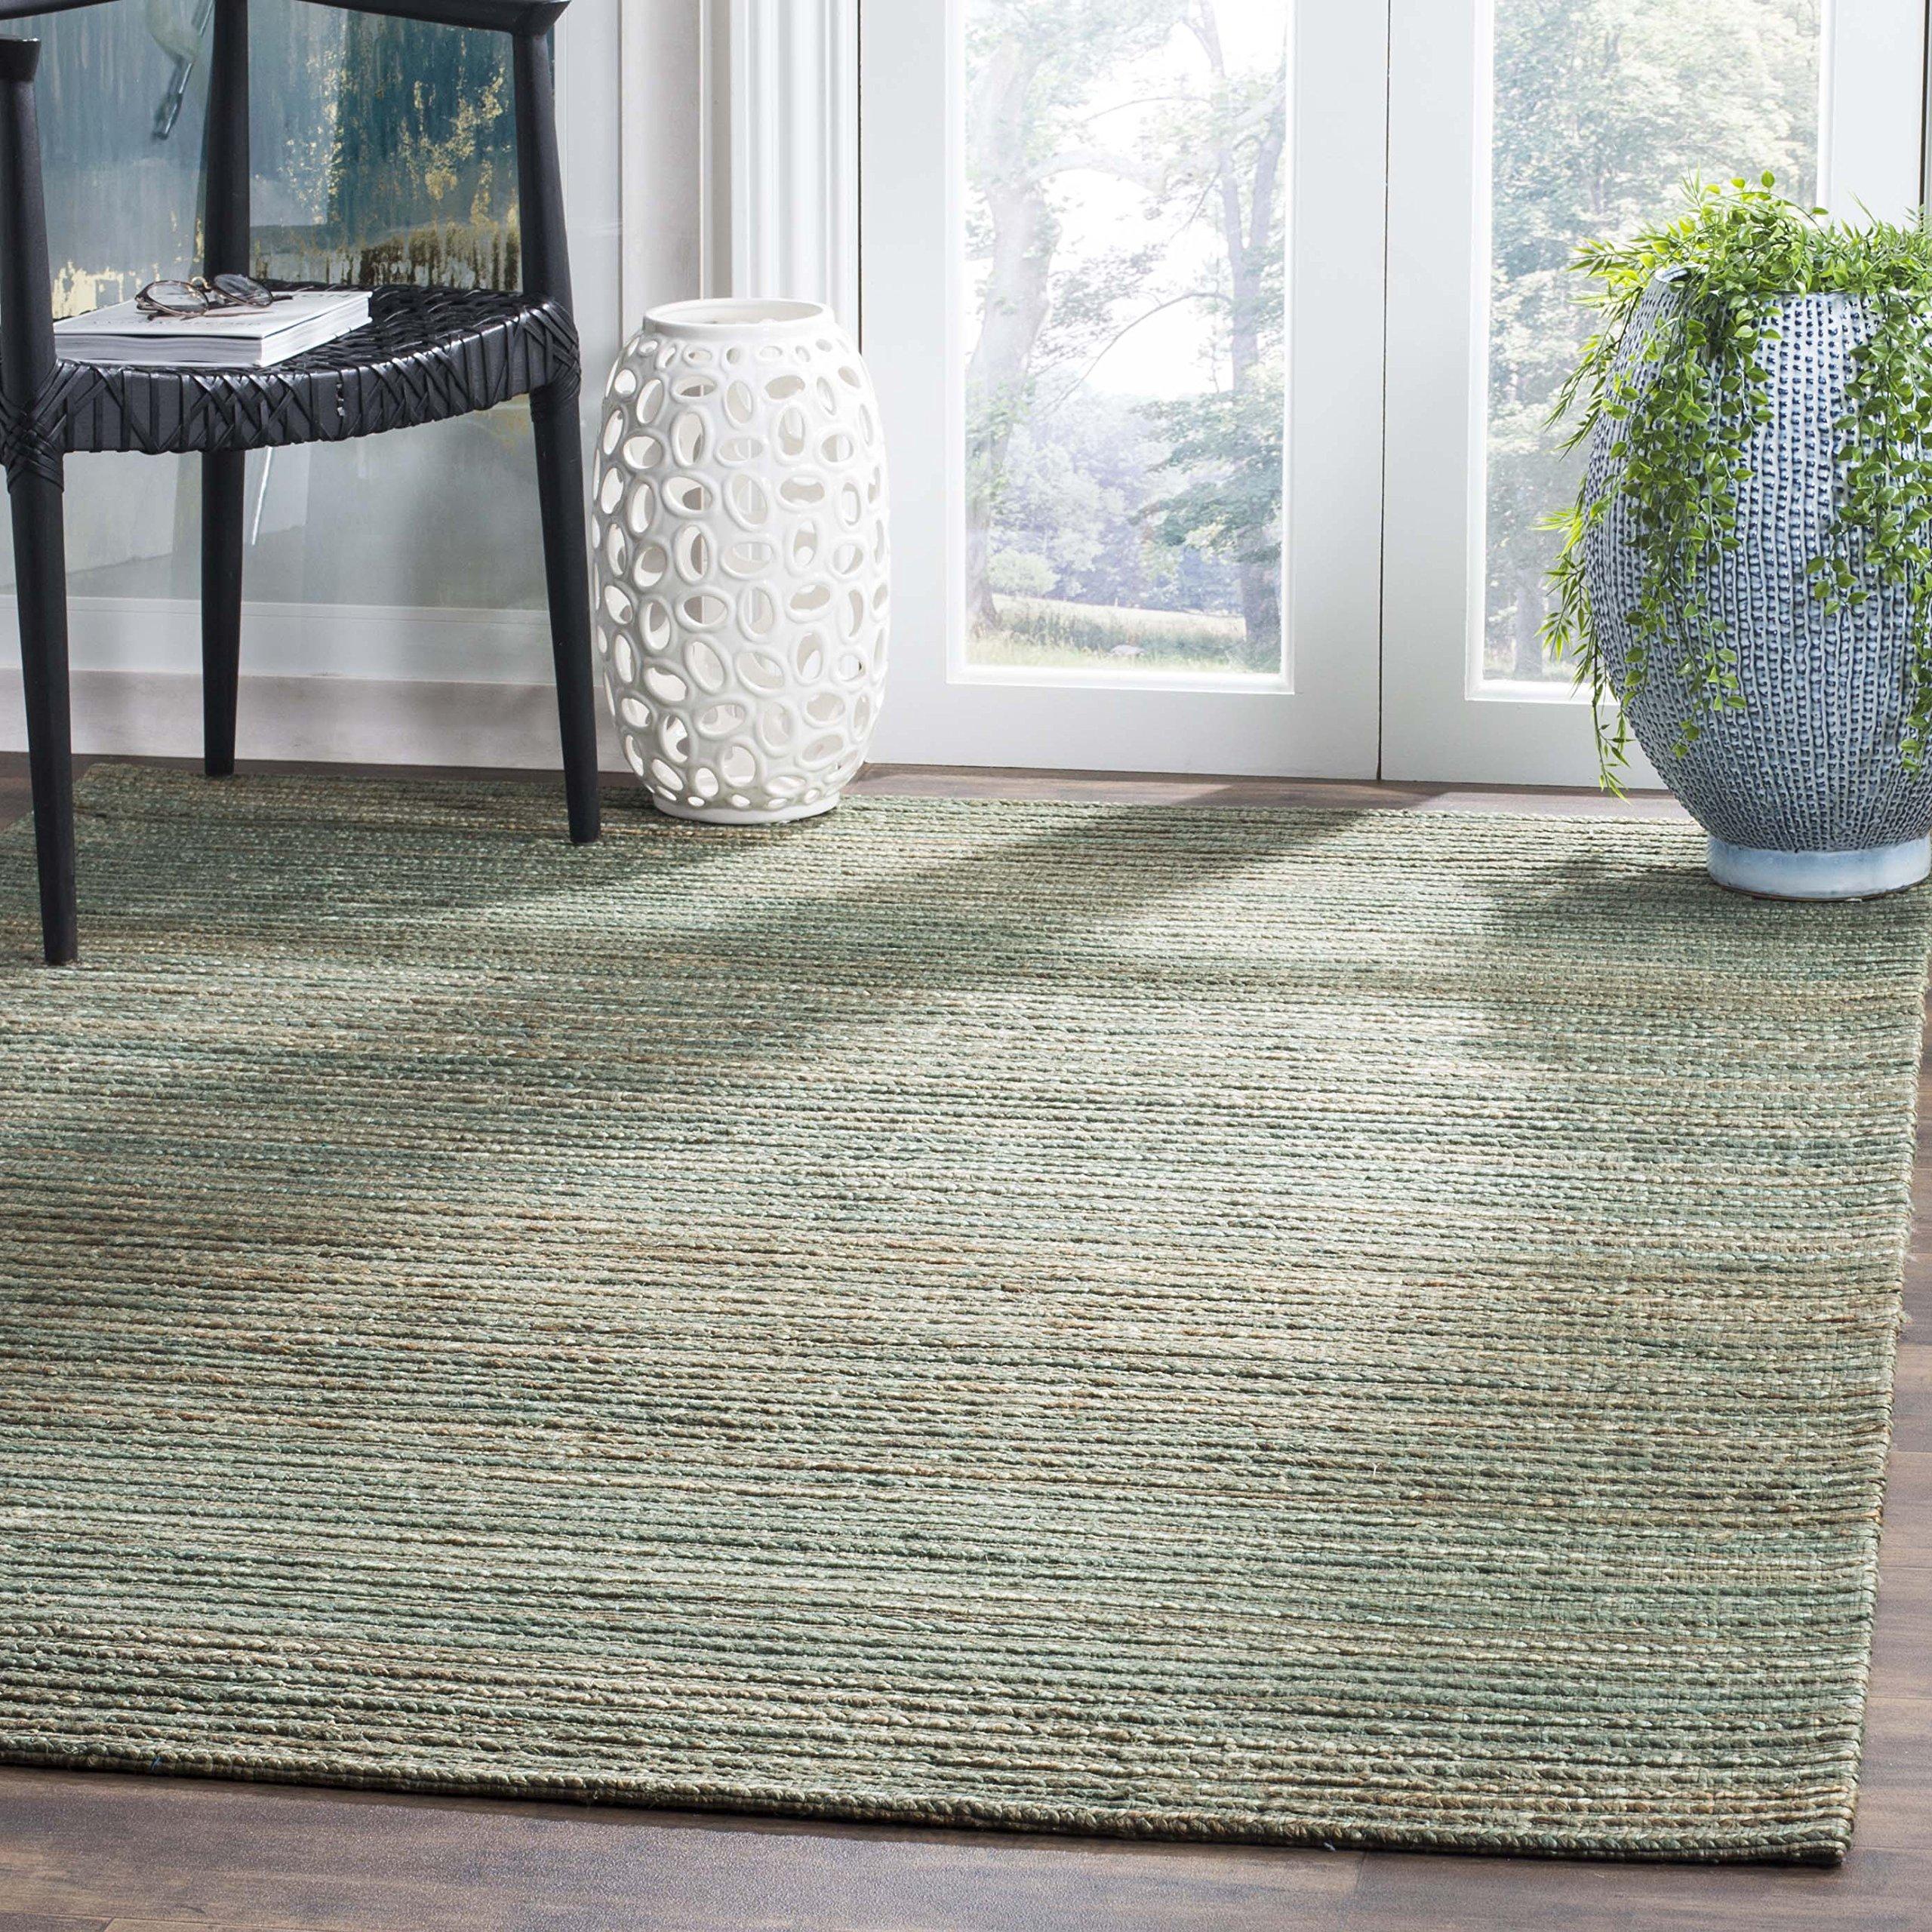 Safavieh CAP503B-5 Cape Cod Collection Flat Weave Handmade Area Rug, 5' x 8', Sage/Natural